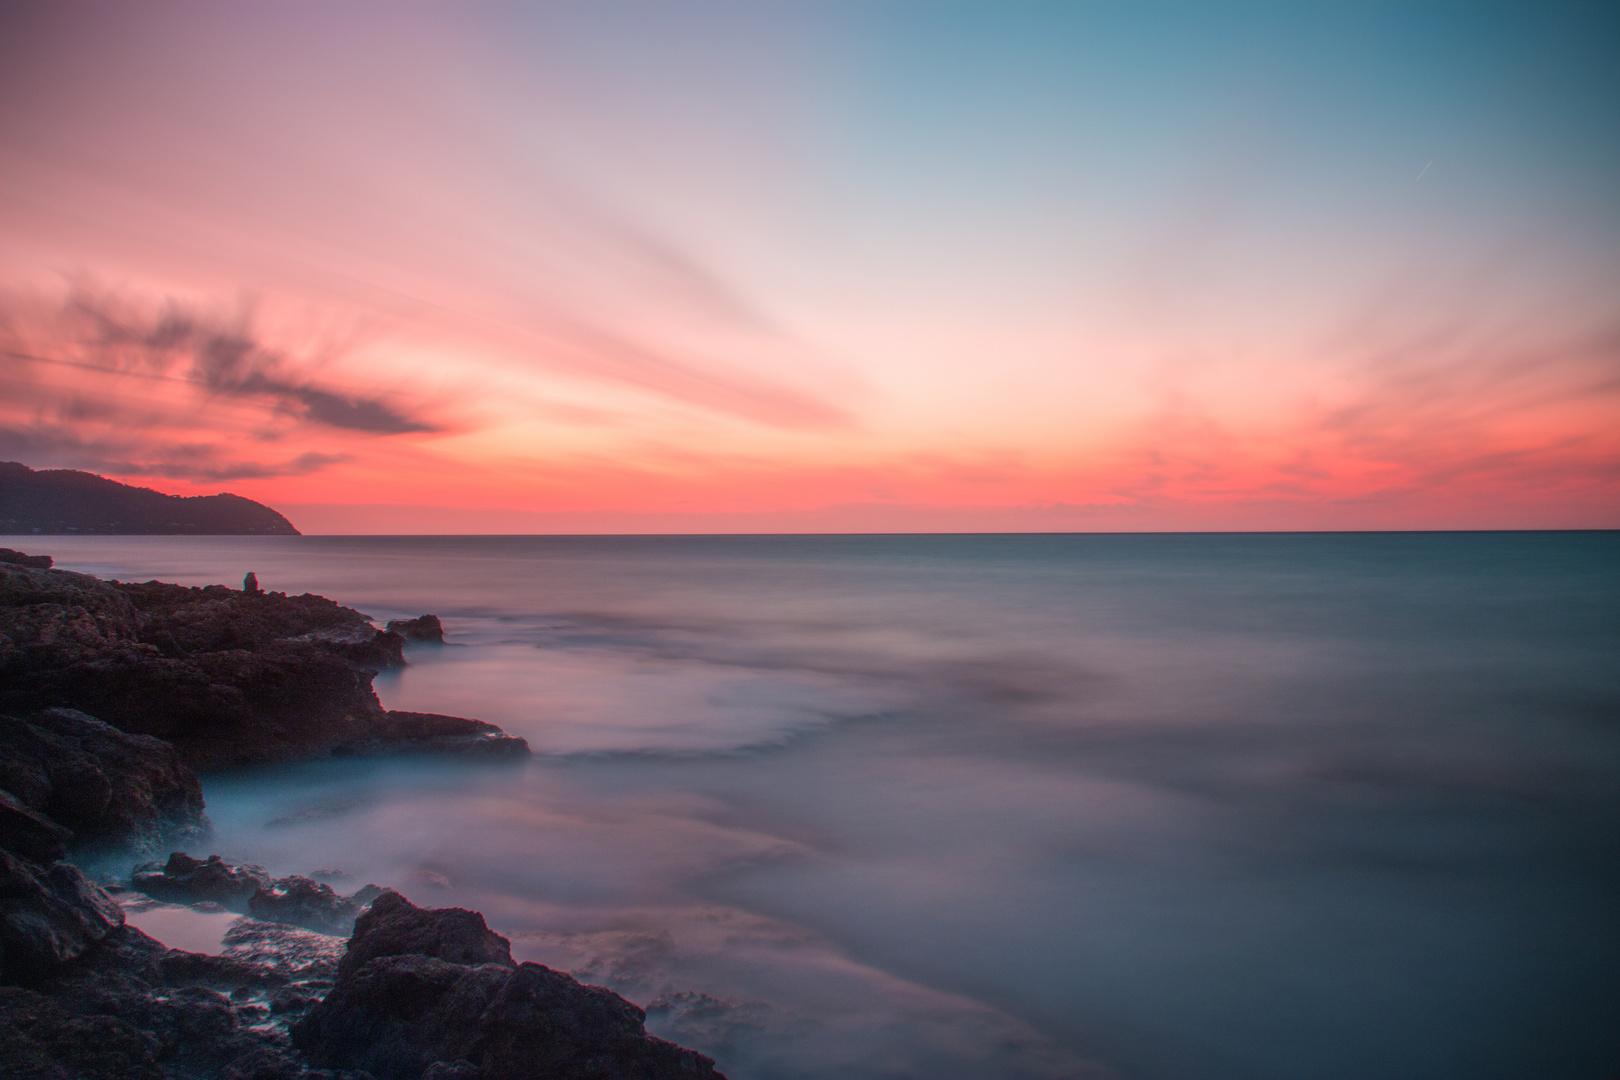 Sonnenaufgang am Mittelmeer Mallorca Cala Millor